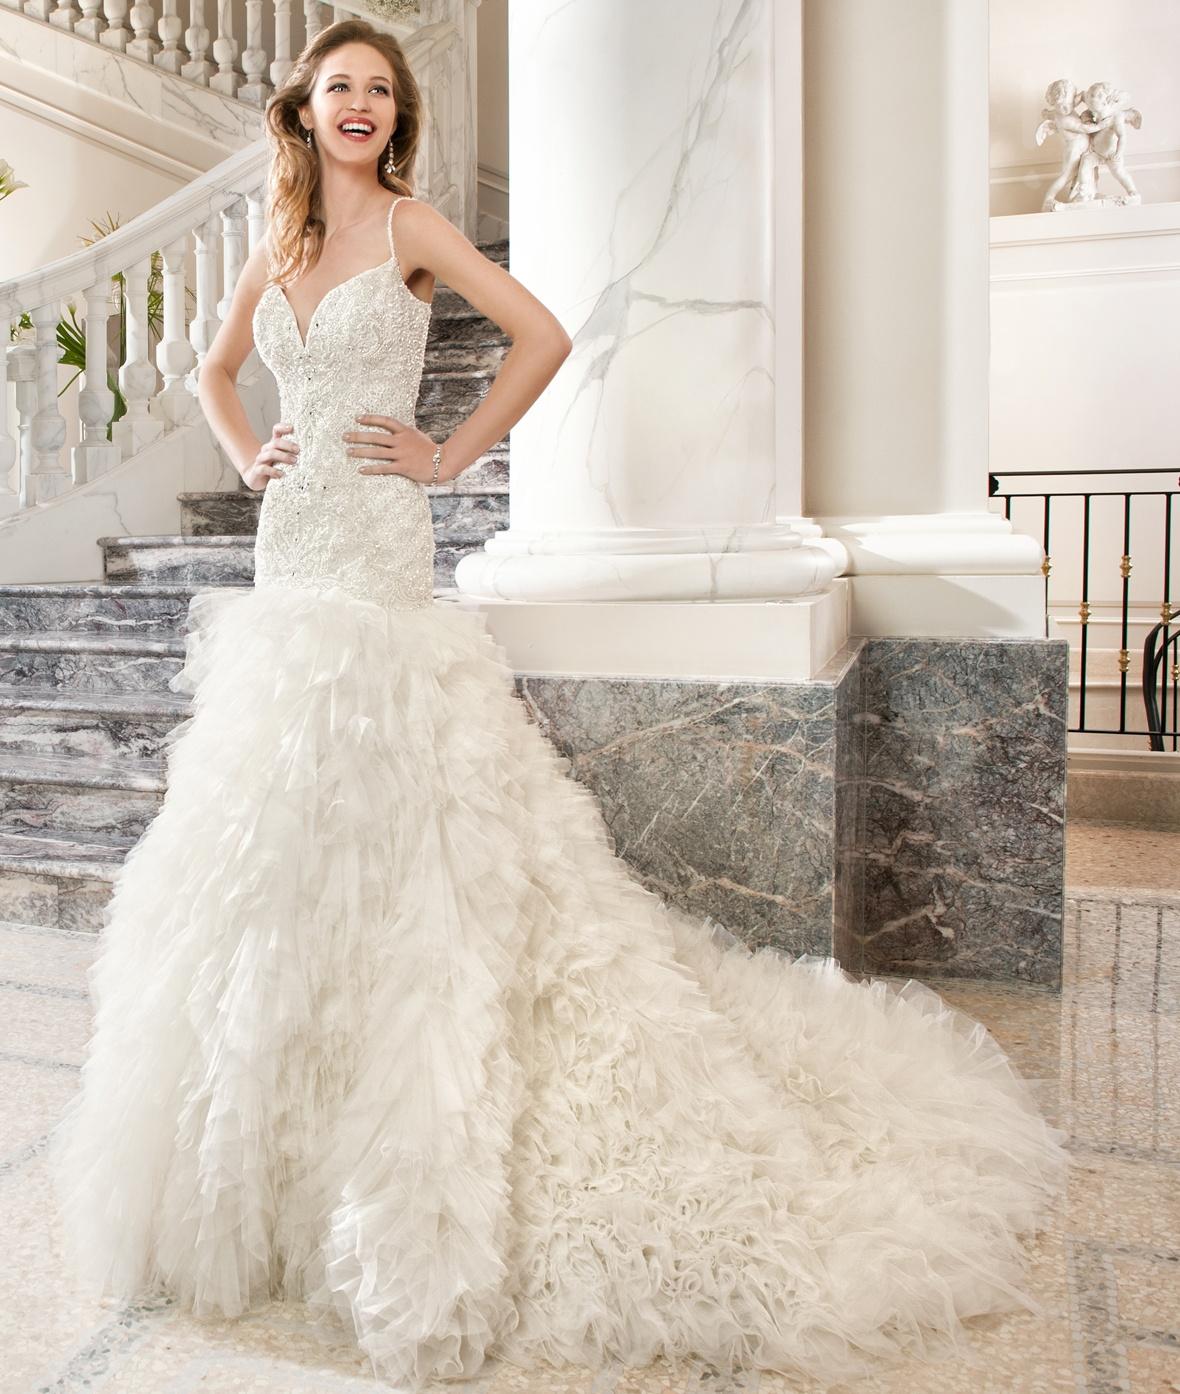 9c7a16238 عالم الزين: فساتين زفاف ديمتريوس 2017-2018